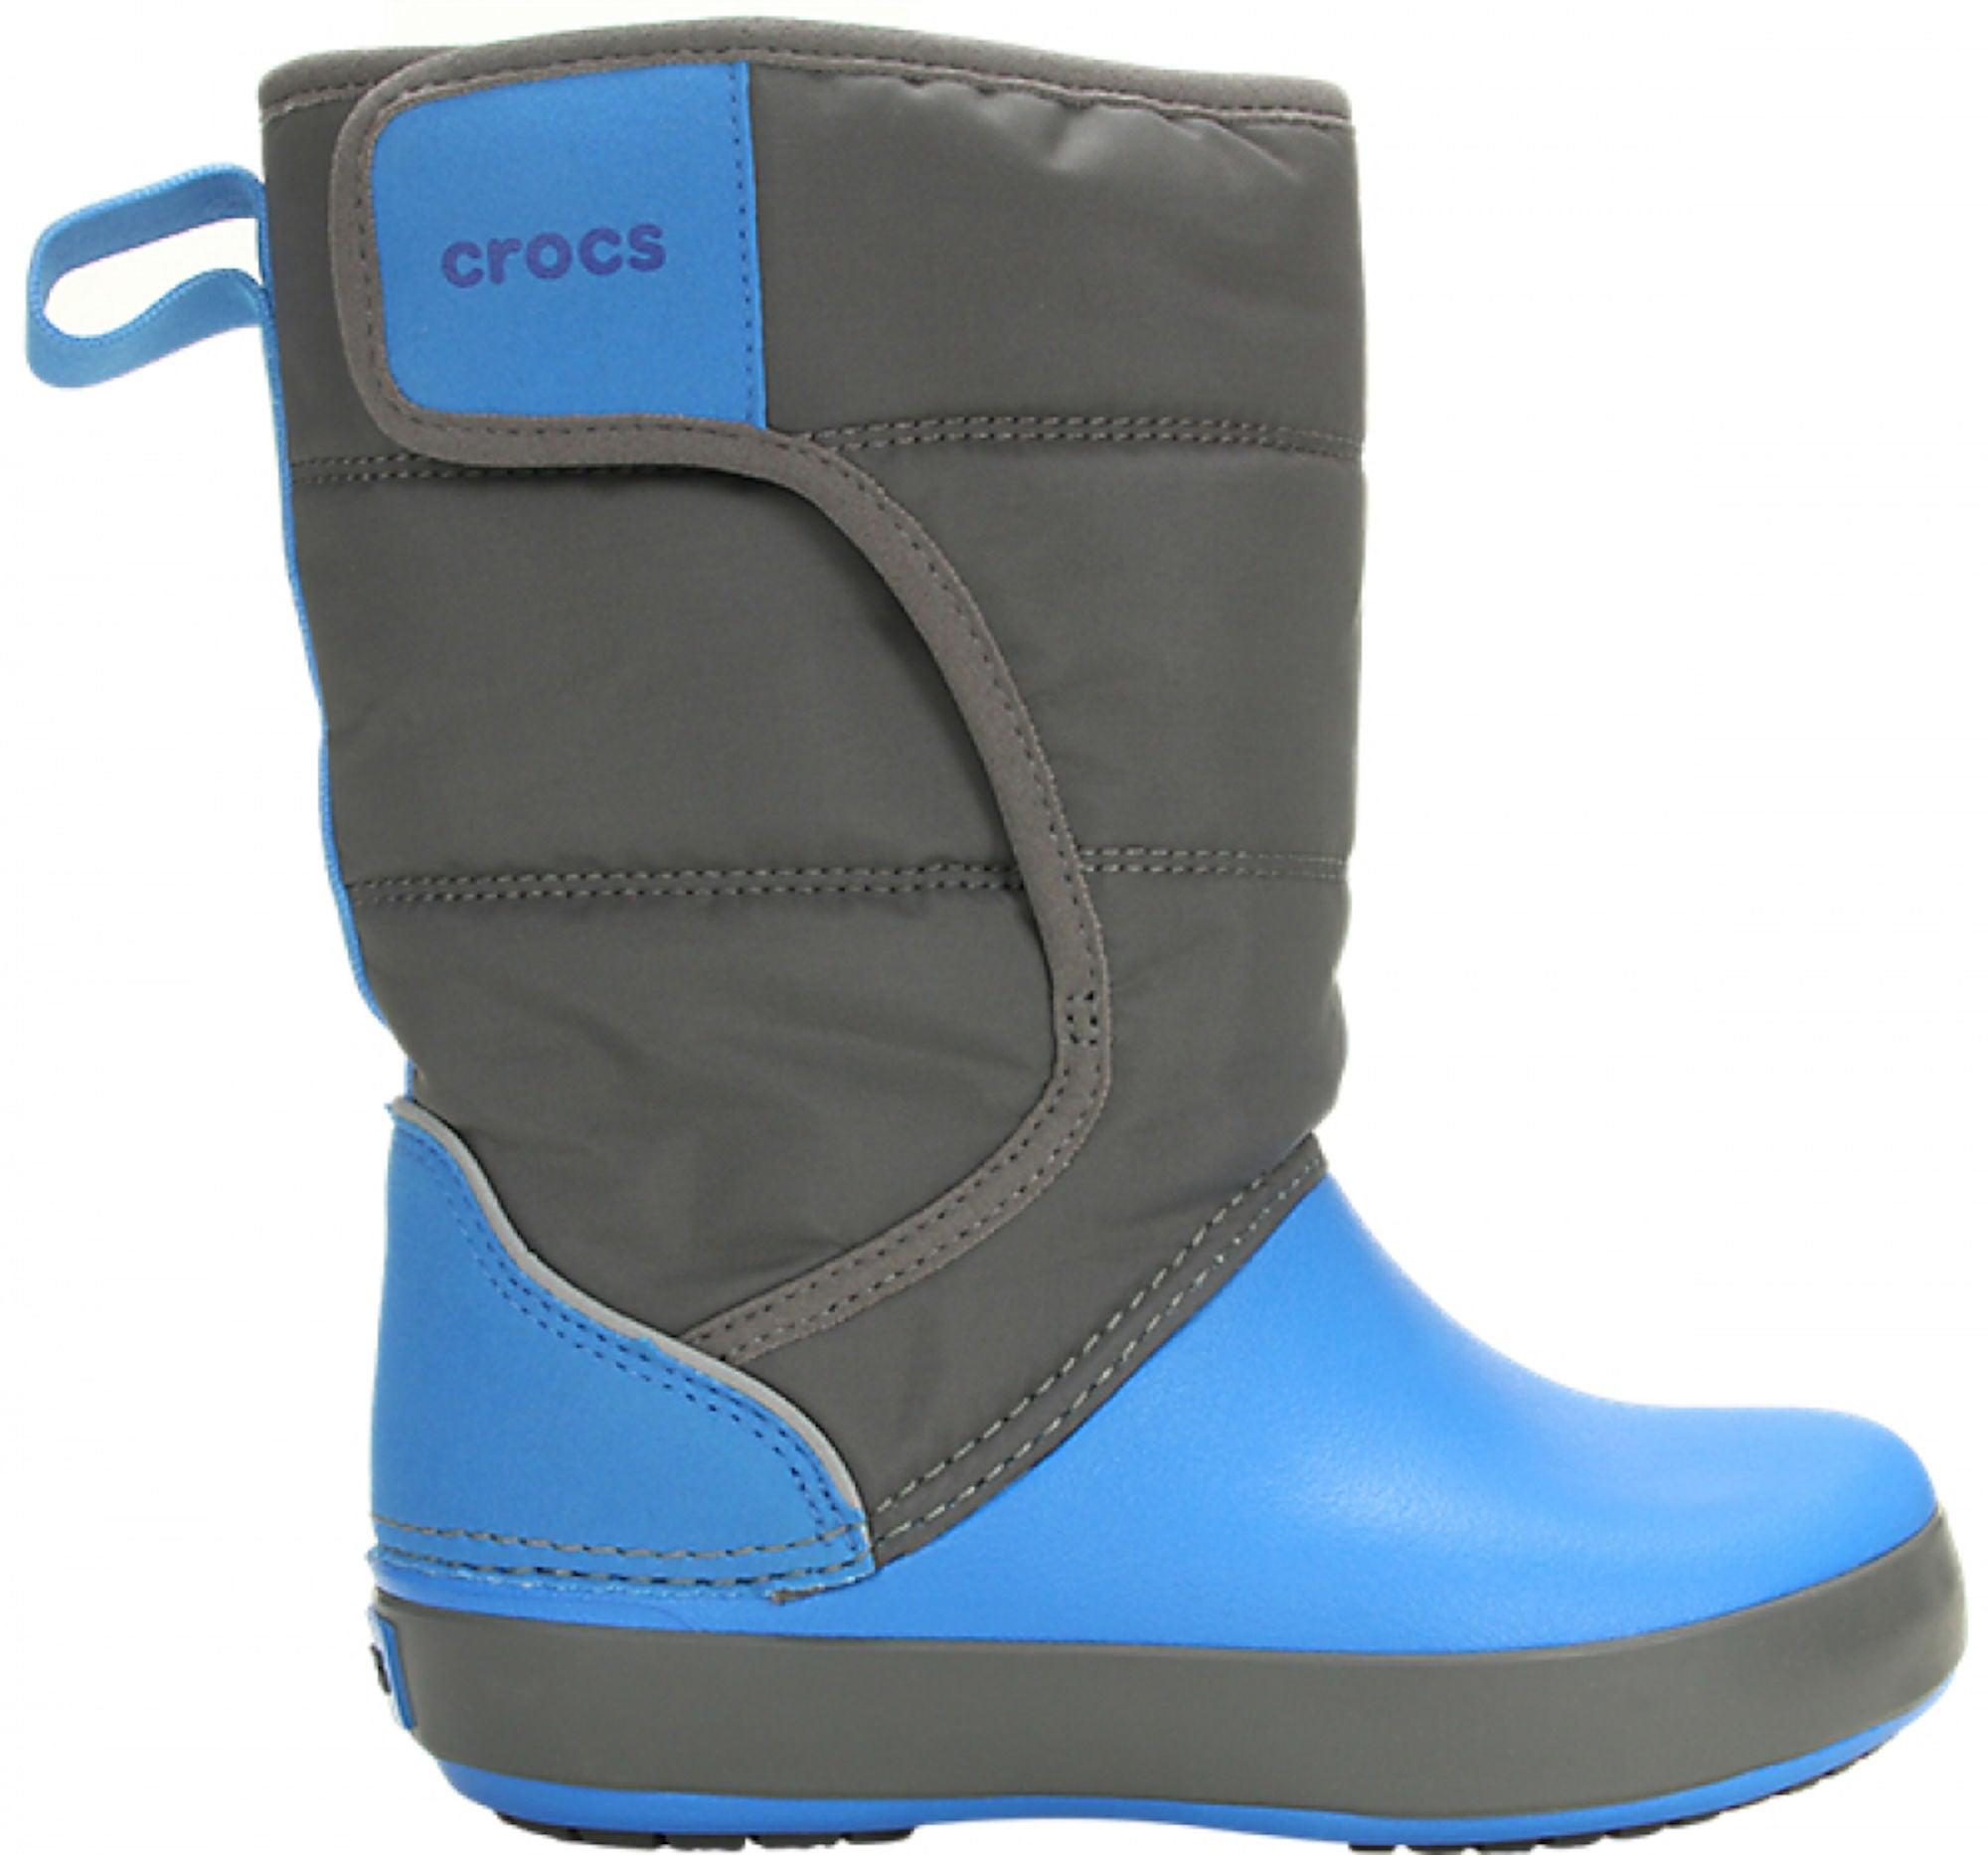 Köp Crocs Kids Crocband LodgePoint Boot, OceanNavy | Jollyroom